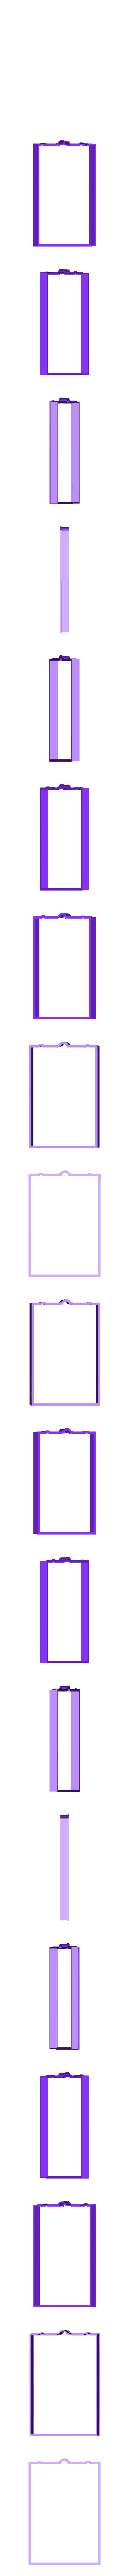 totem b.stl Download STL file coco cookie cutter x3 • Model to 3D print, arprint3d